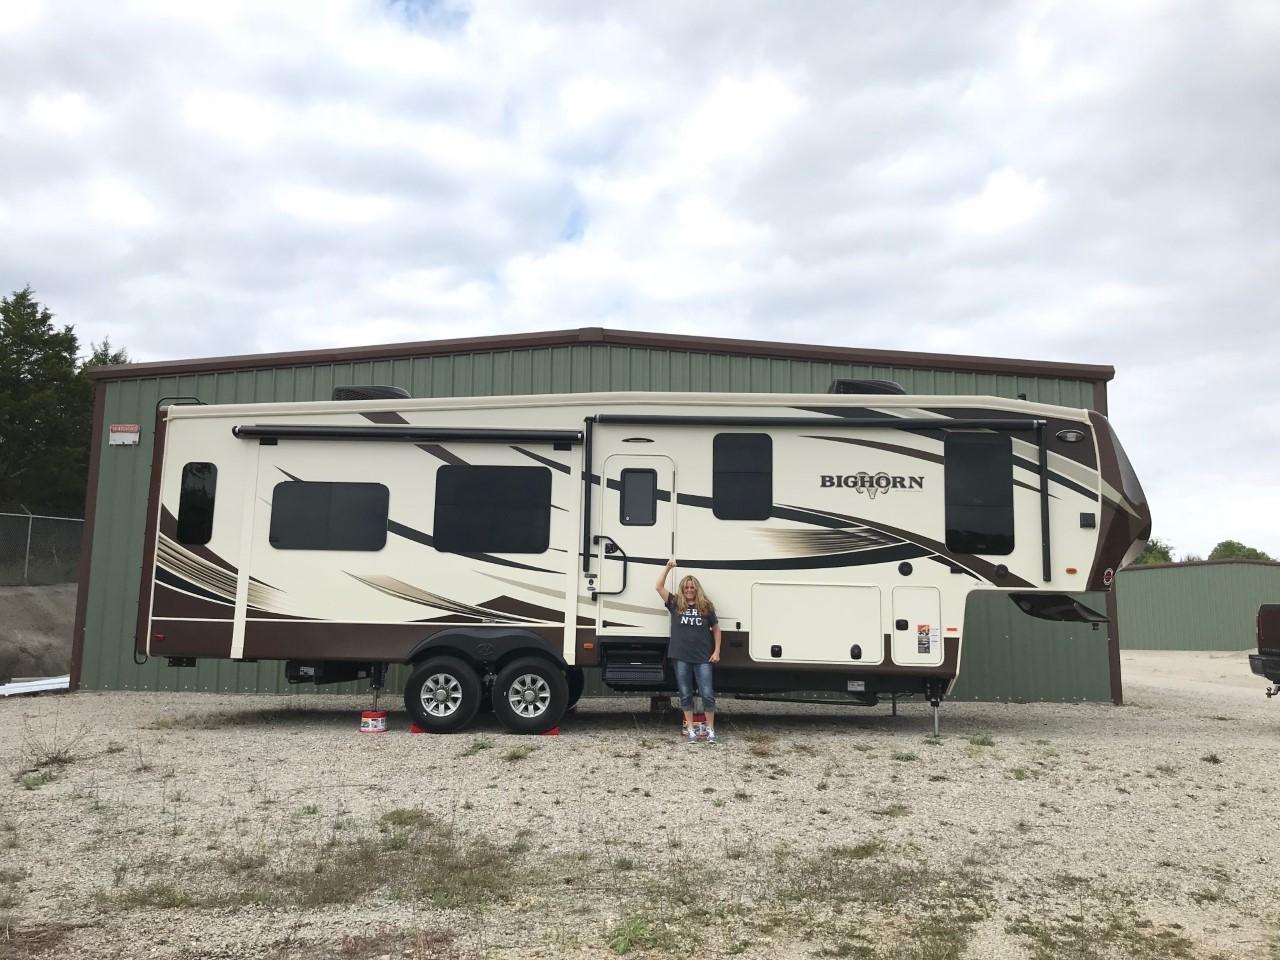 RV Toy Hauler Trailer Motor Home Coach 5TH Wheel Off Road Camper Iron Cross Flag